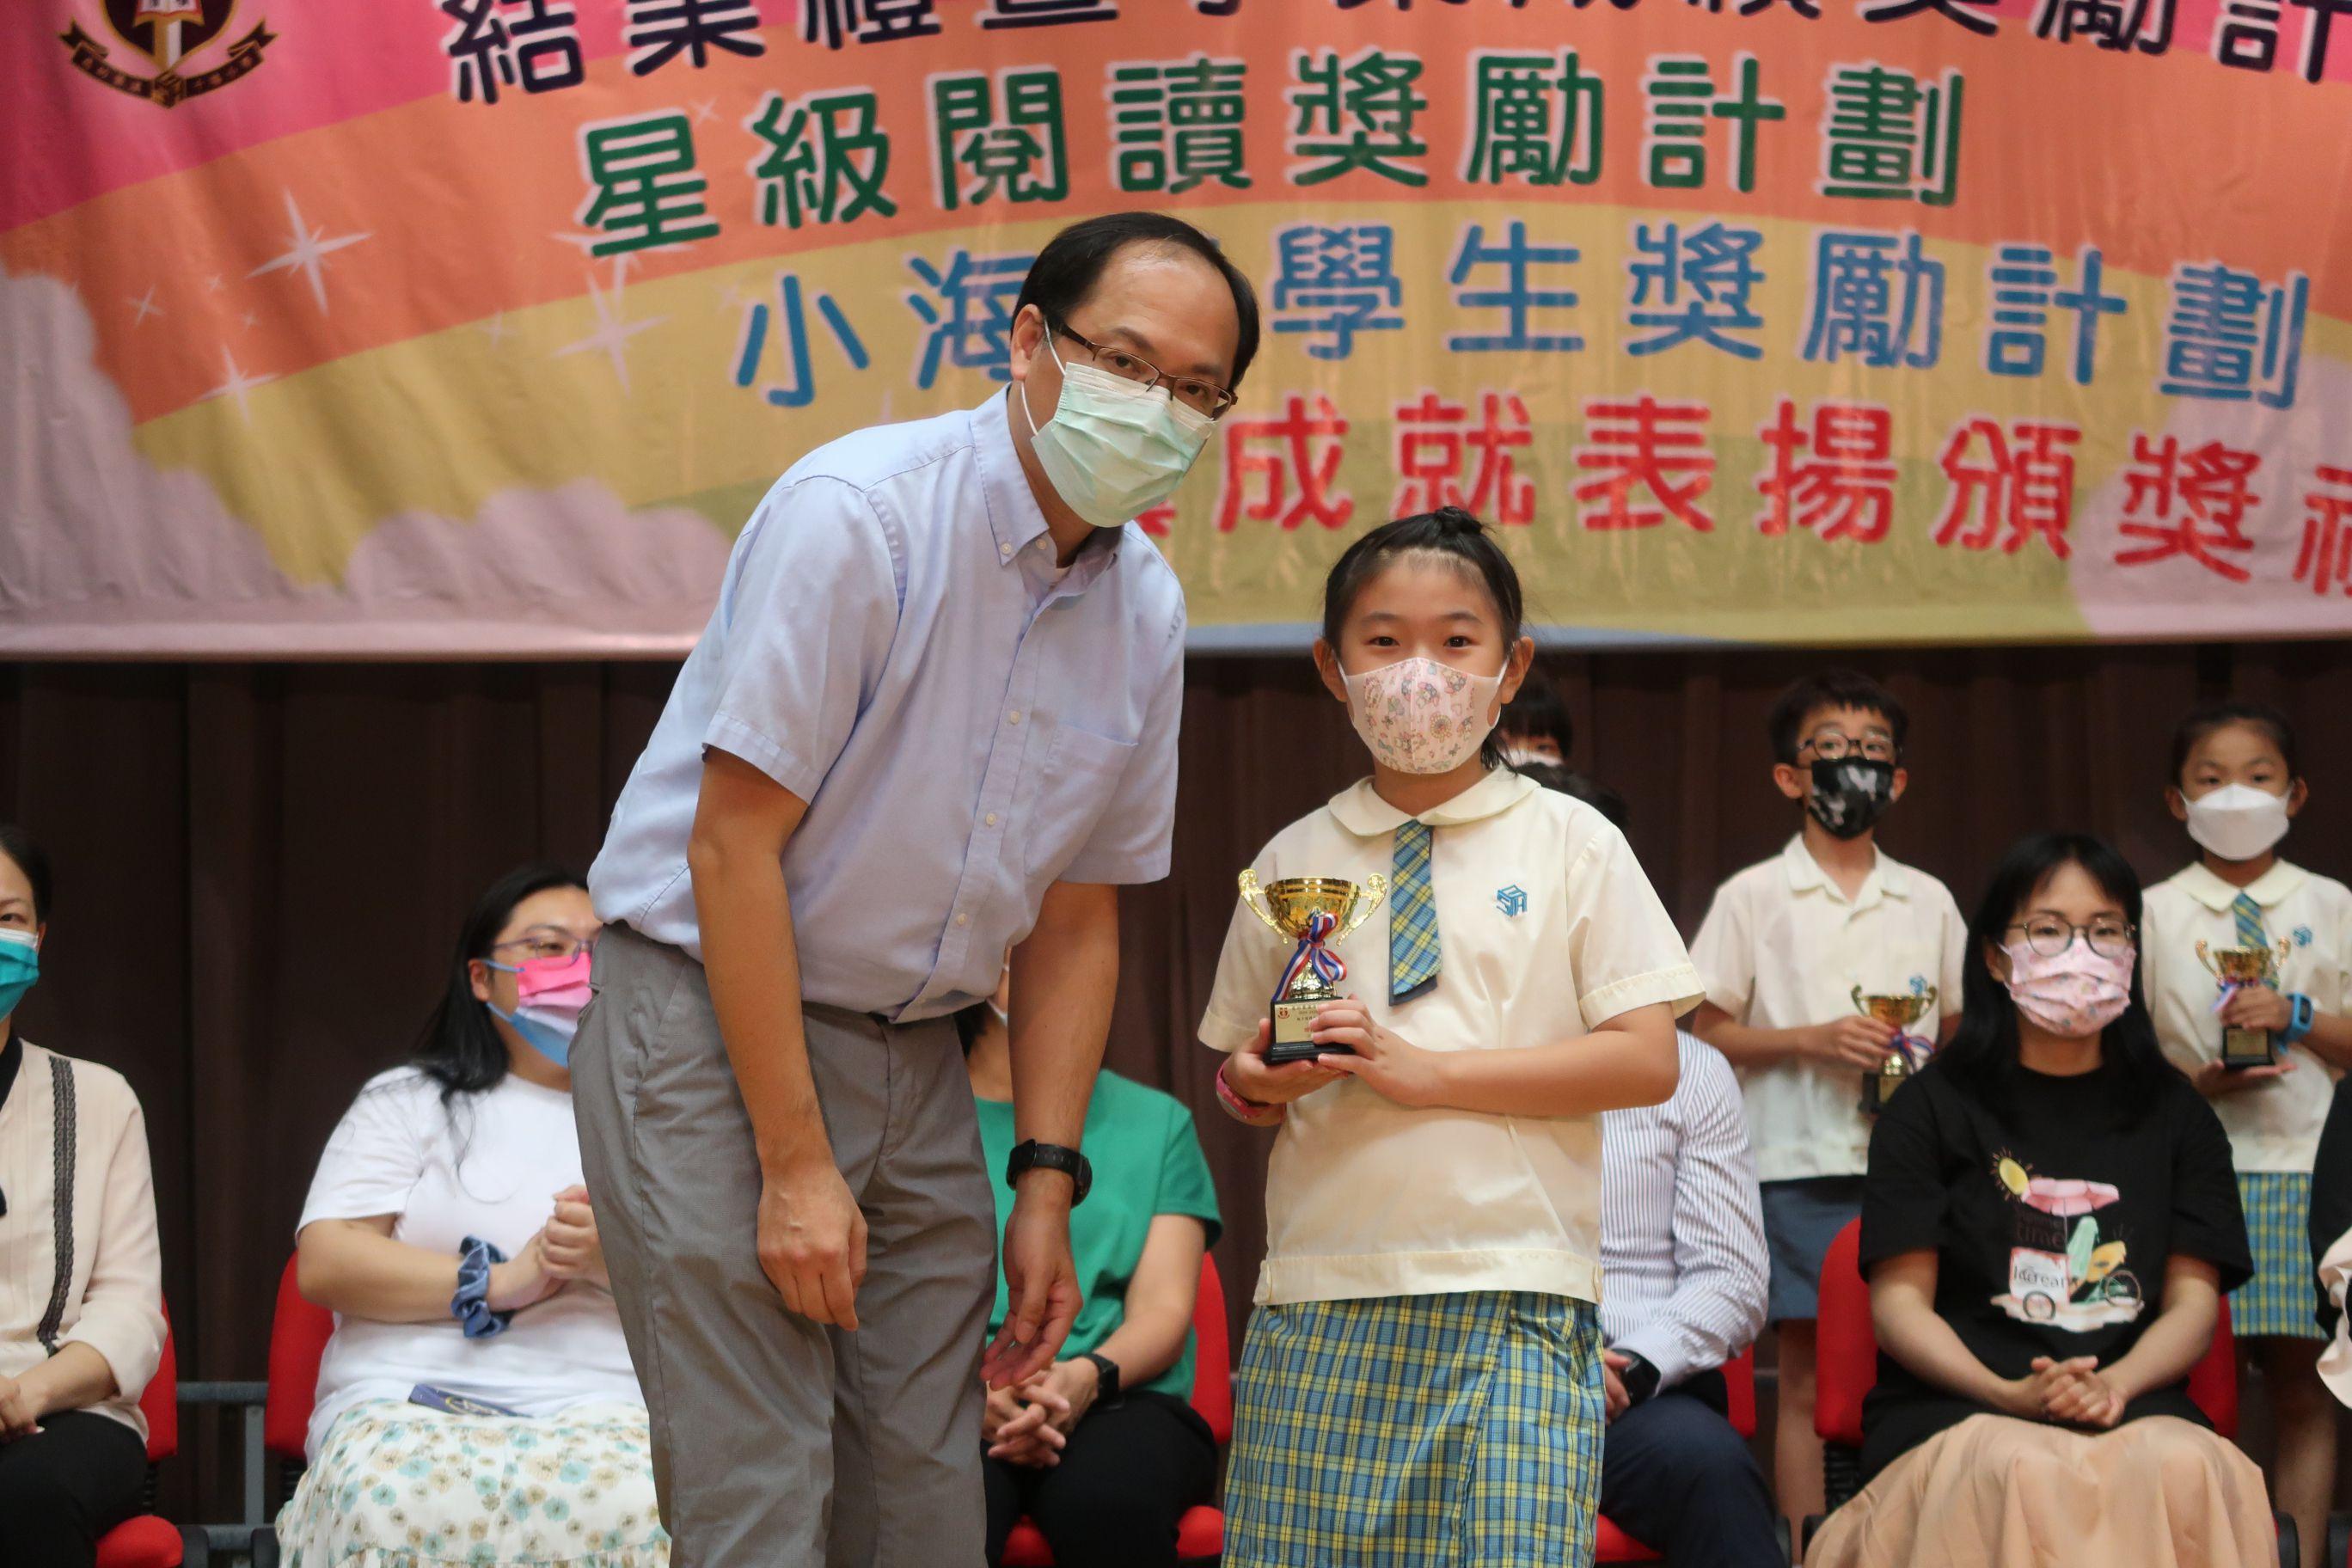 https://syh.edu.hk/sites/default/files/img_5845.jpg